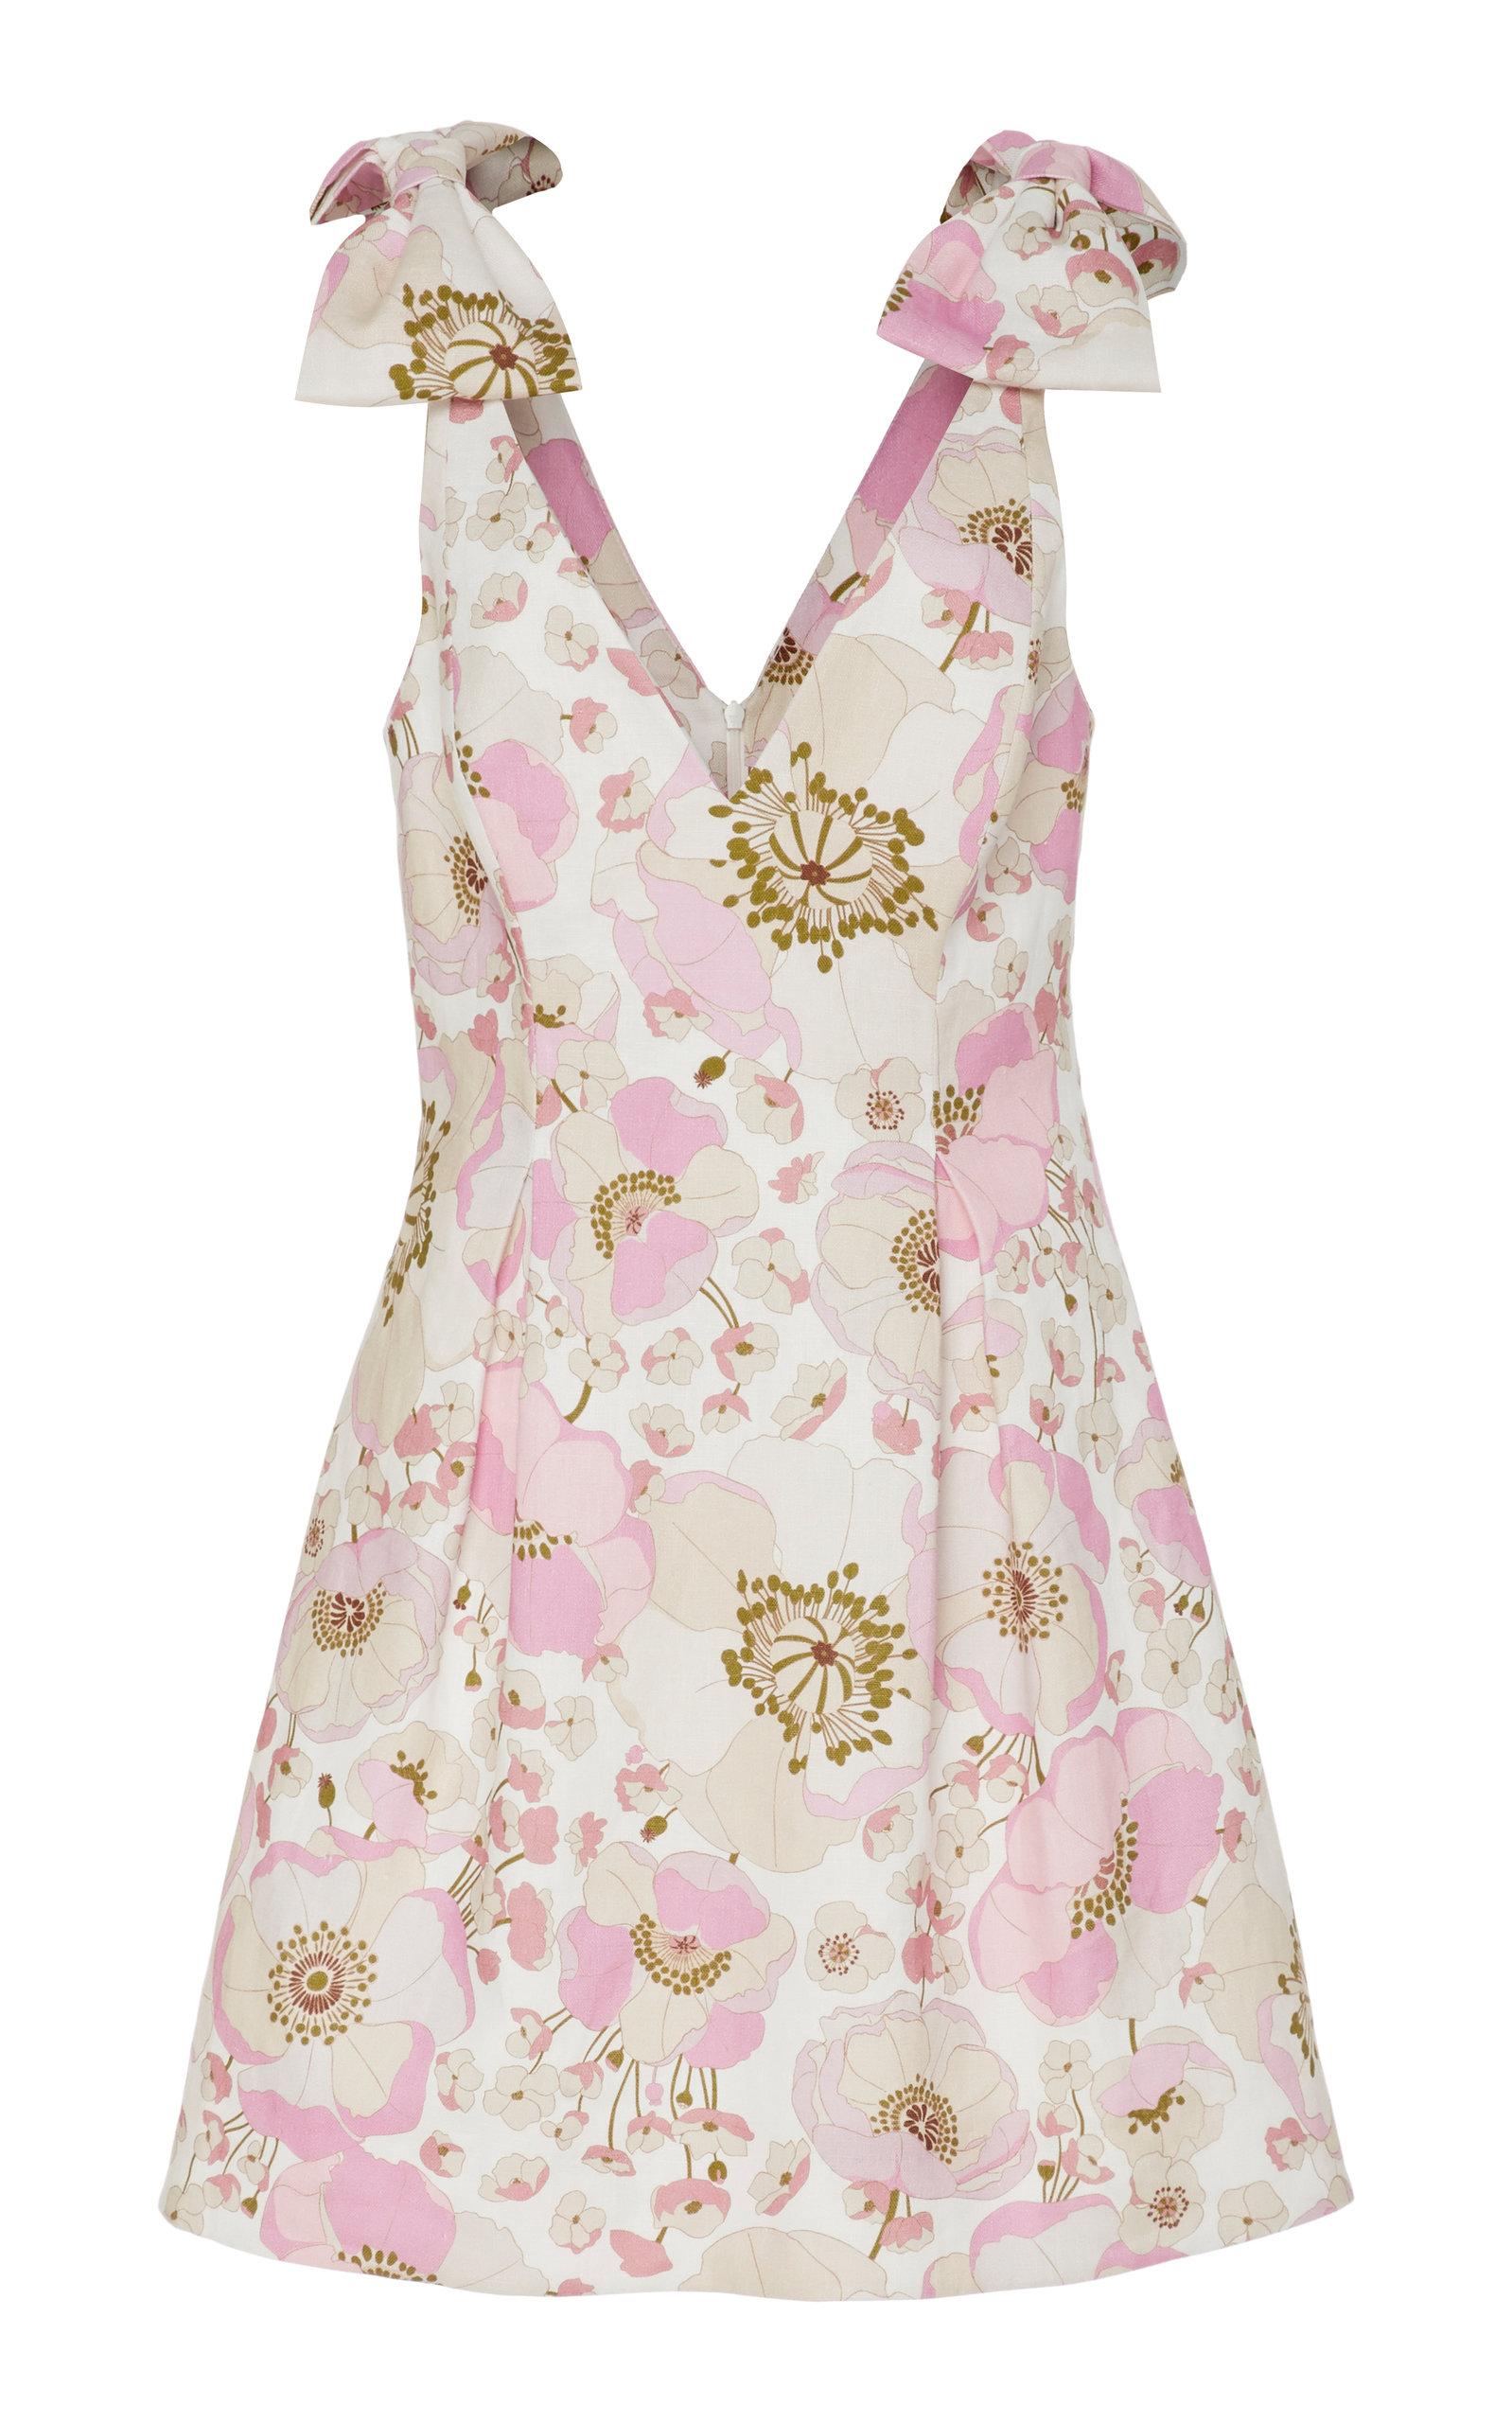 Buy Zimmermann Tie-Detailed Floral-Print Linen Mini Dress online, shop Zimmermann at the best price